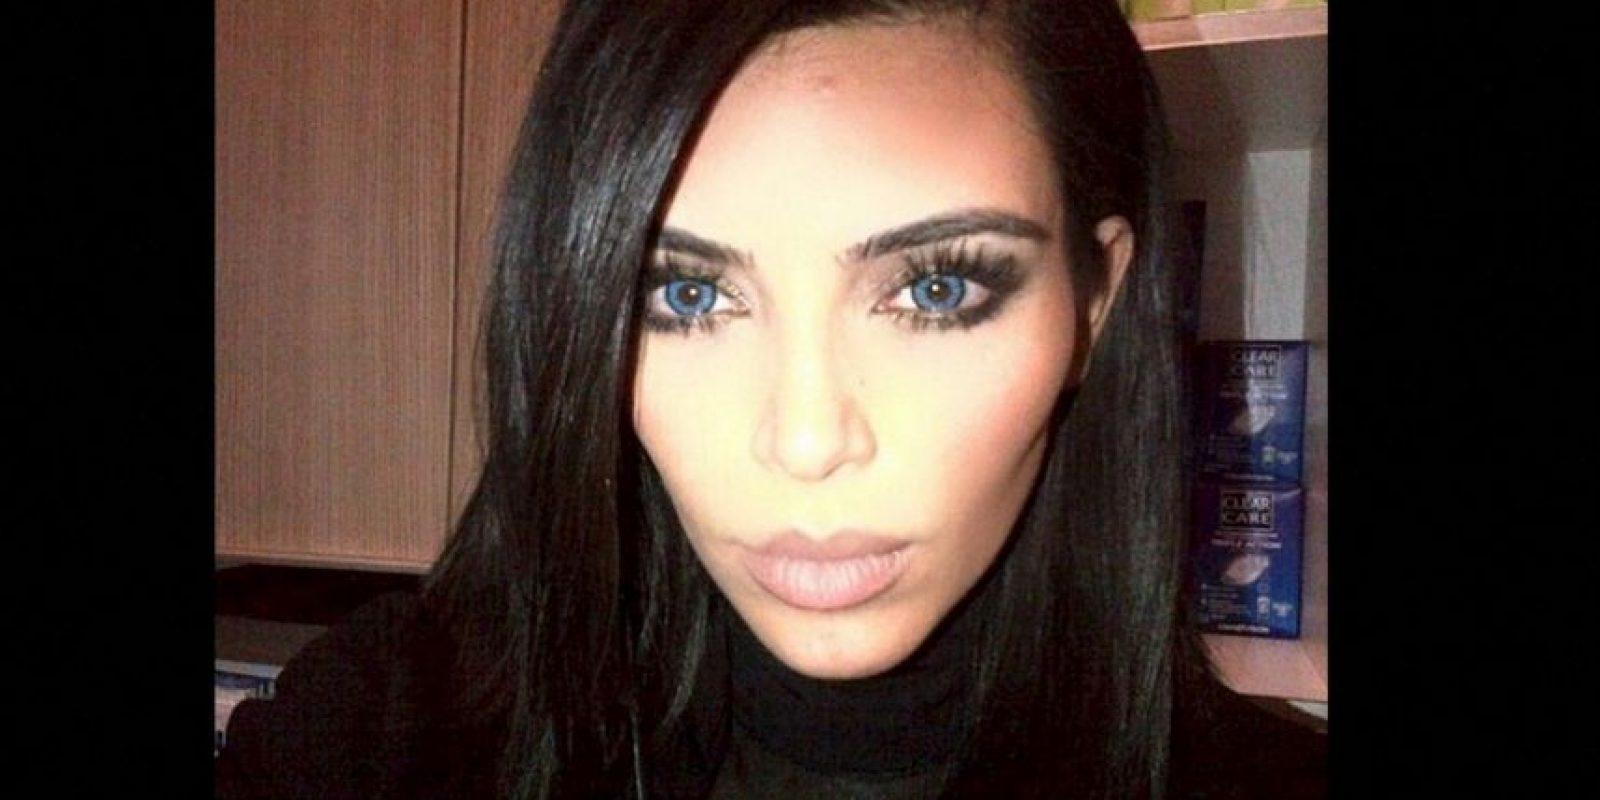 Kim con ojos azules Foto:Instagram @kimkardashian